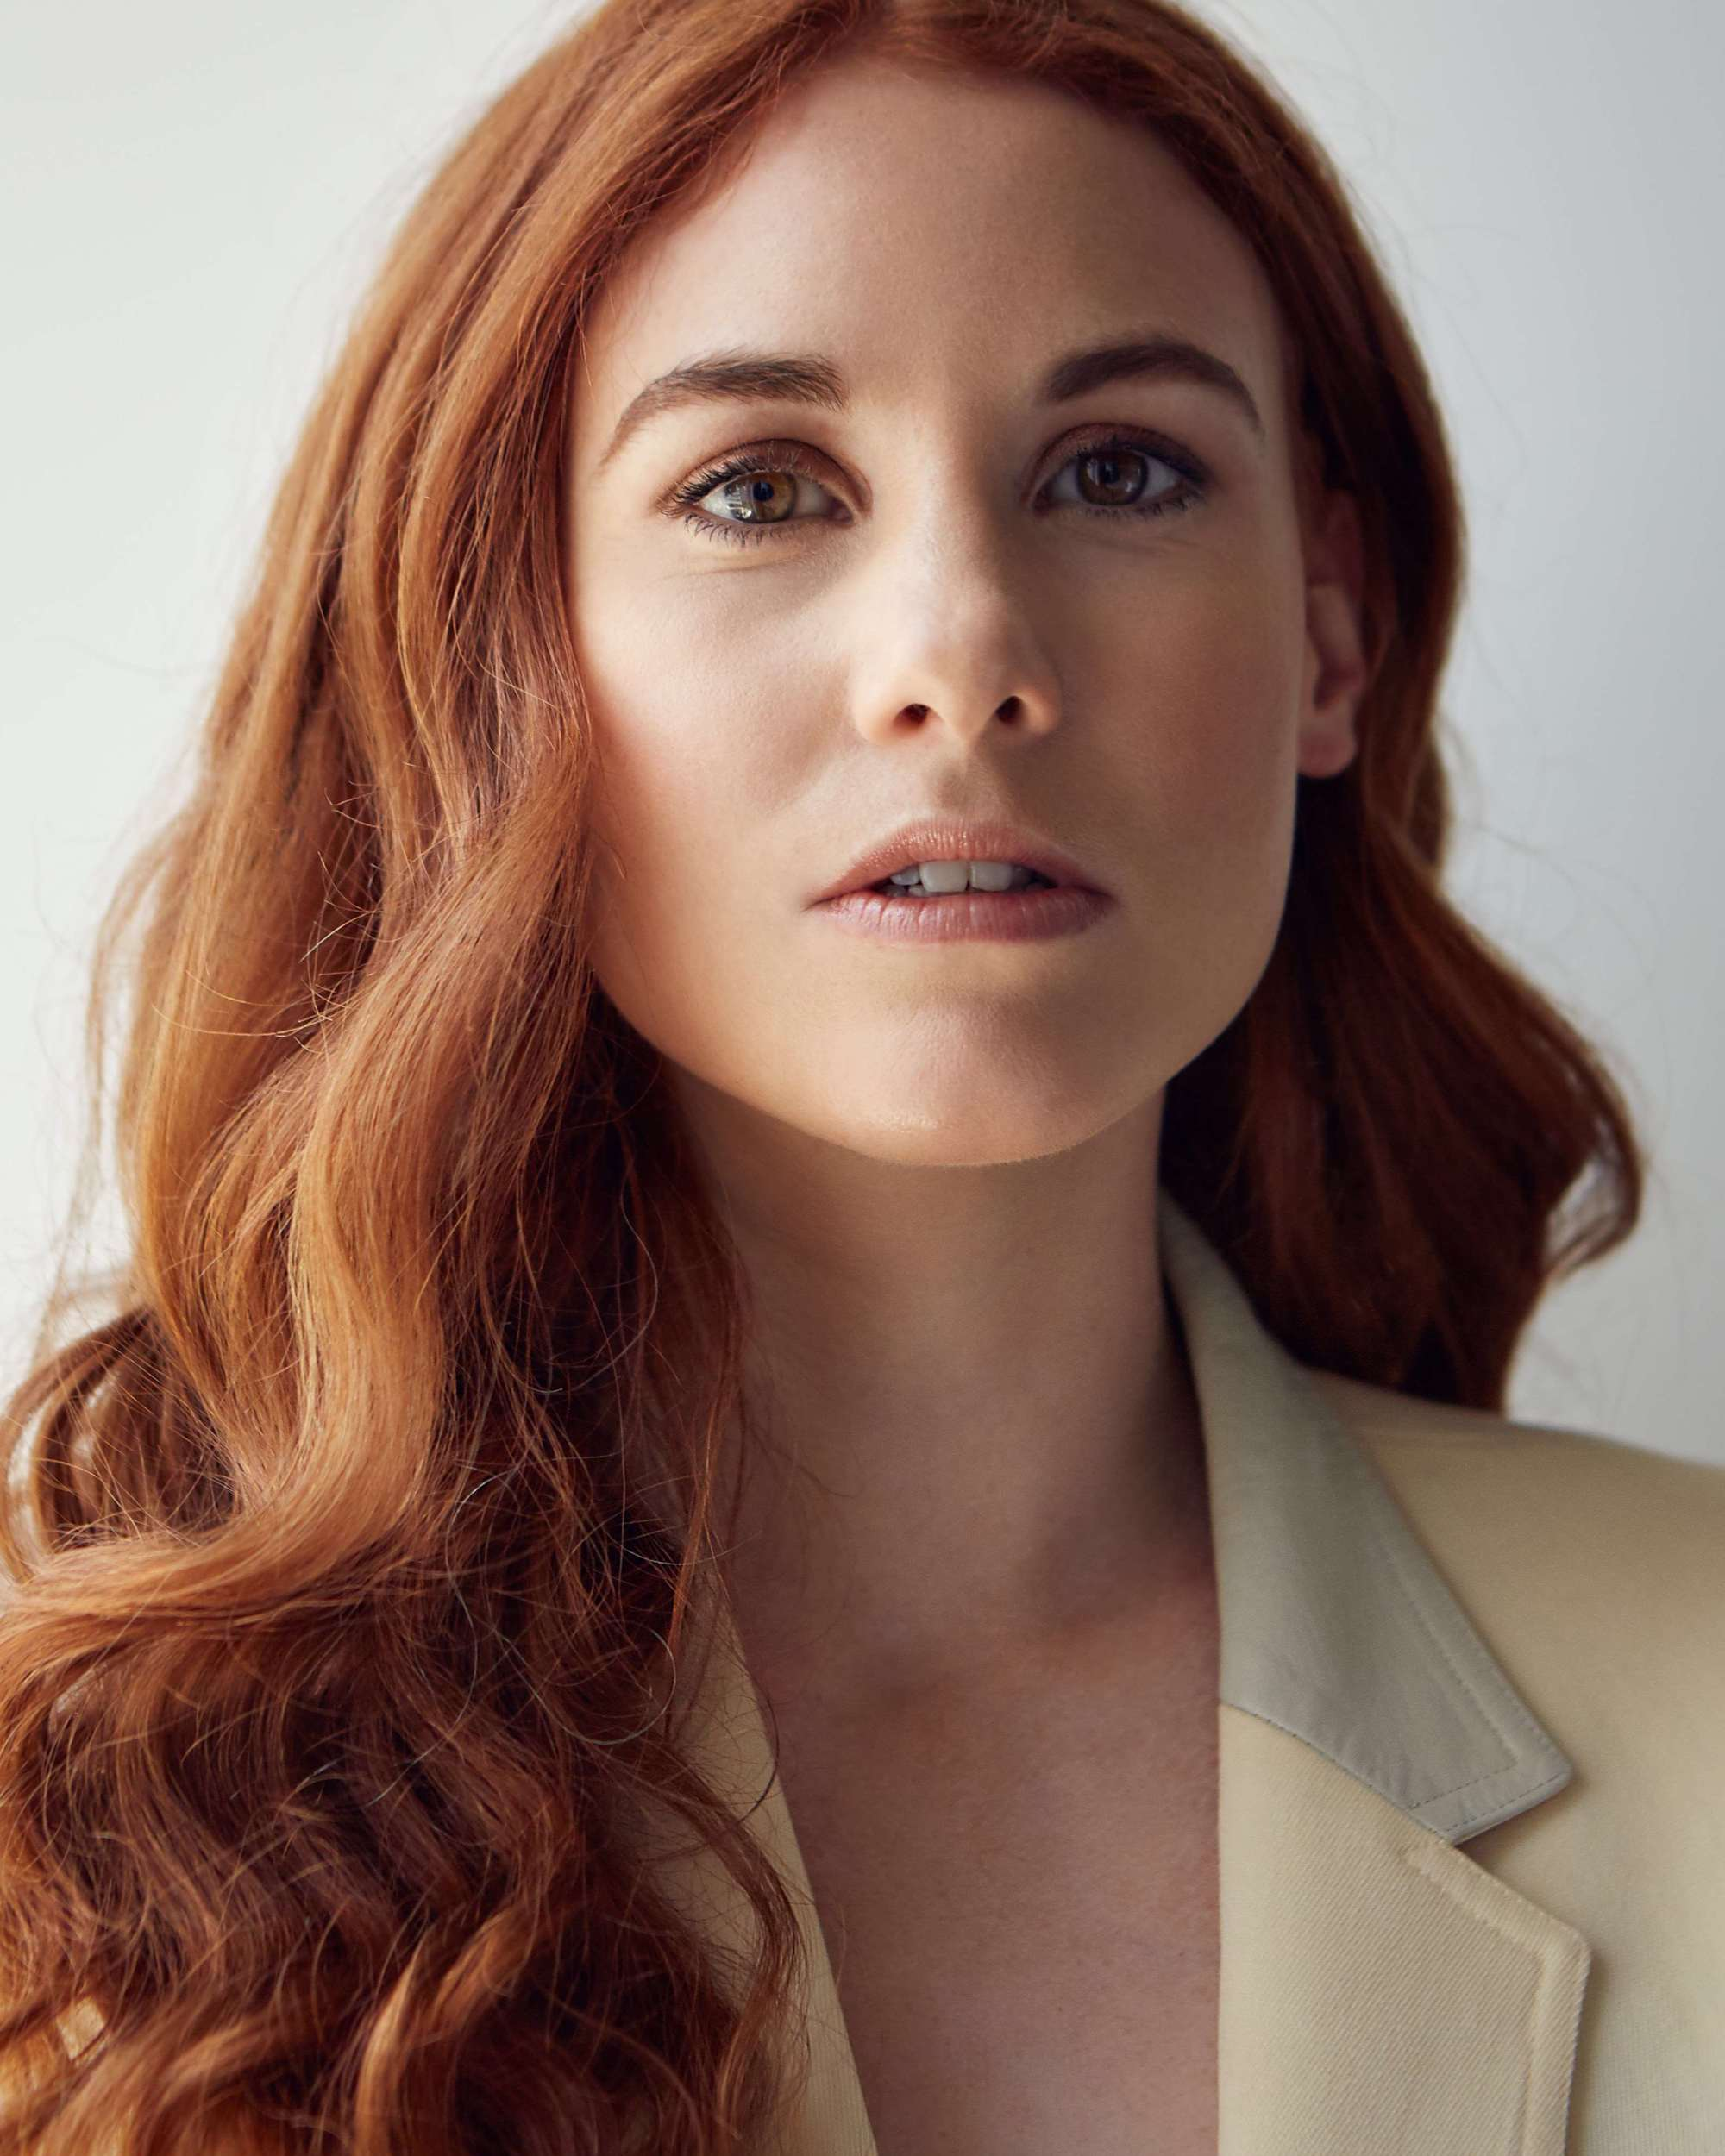 Danielle Baynes